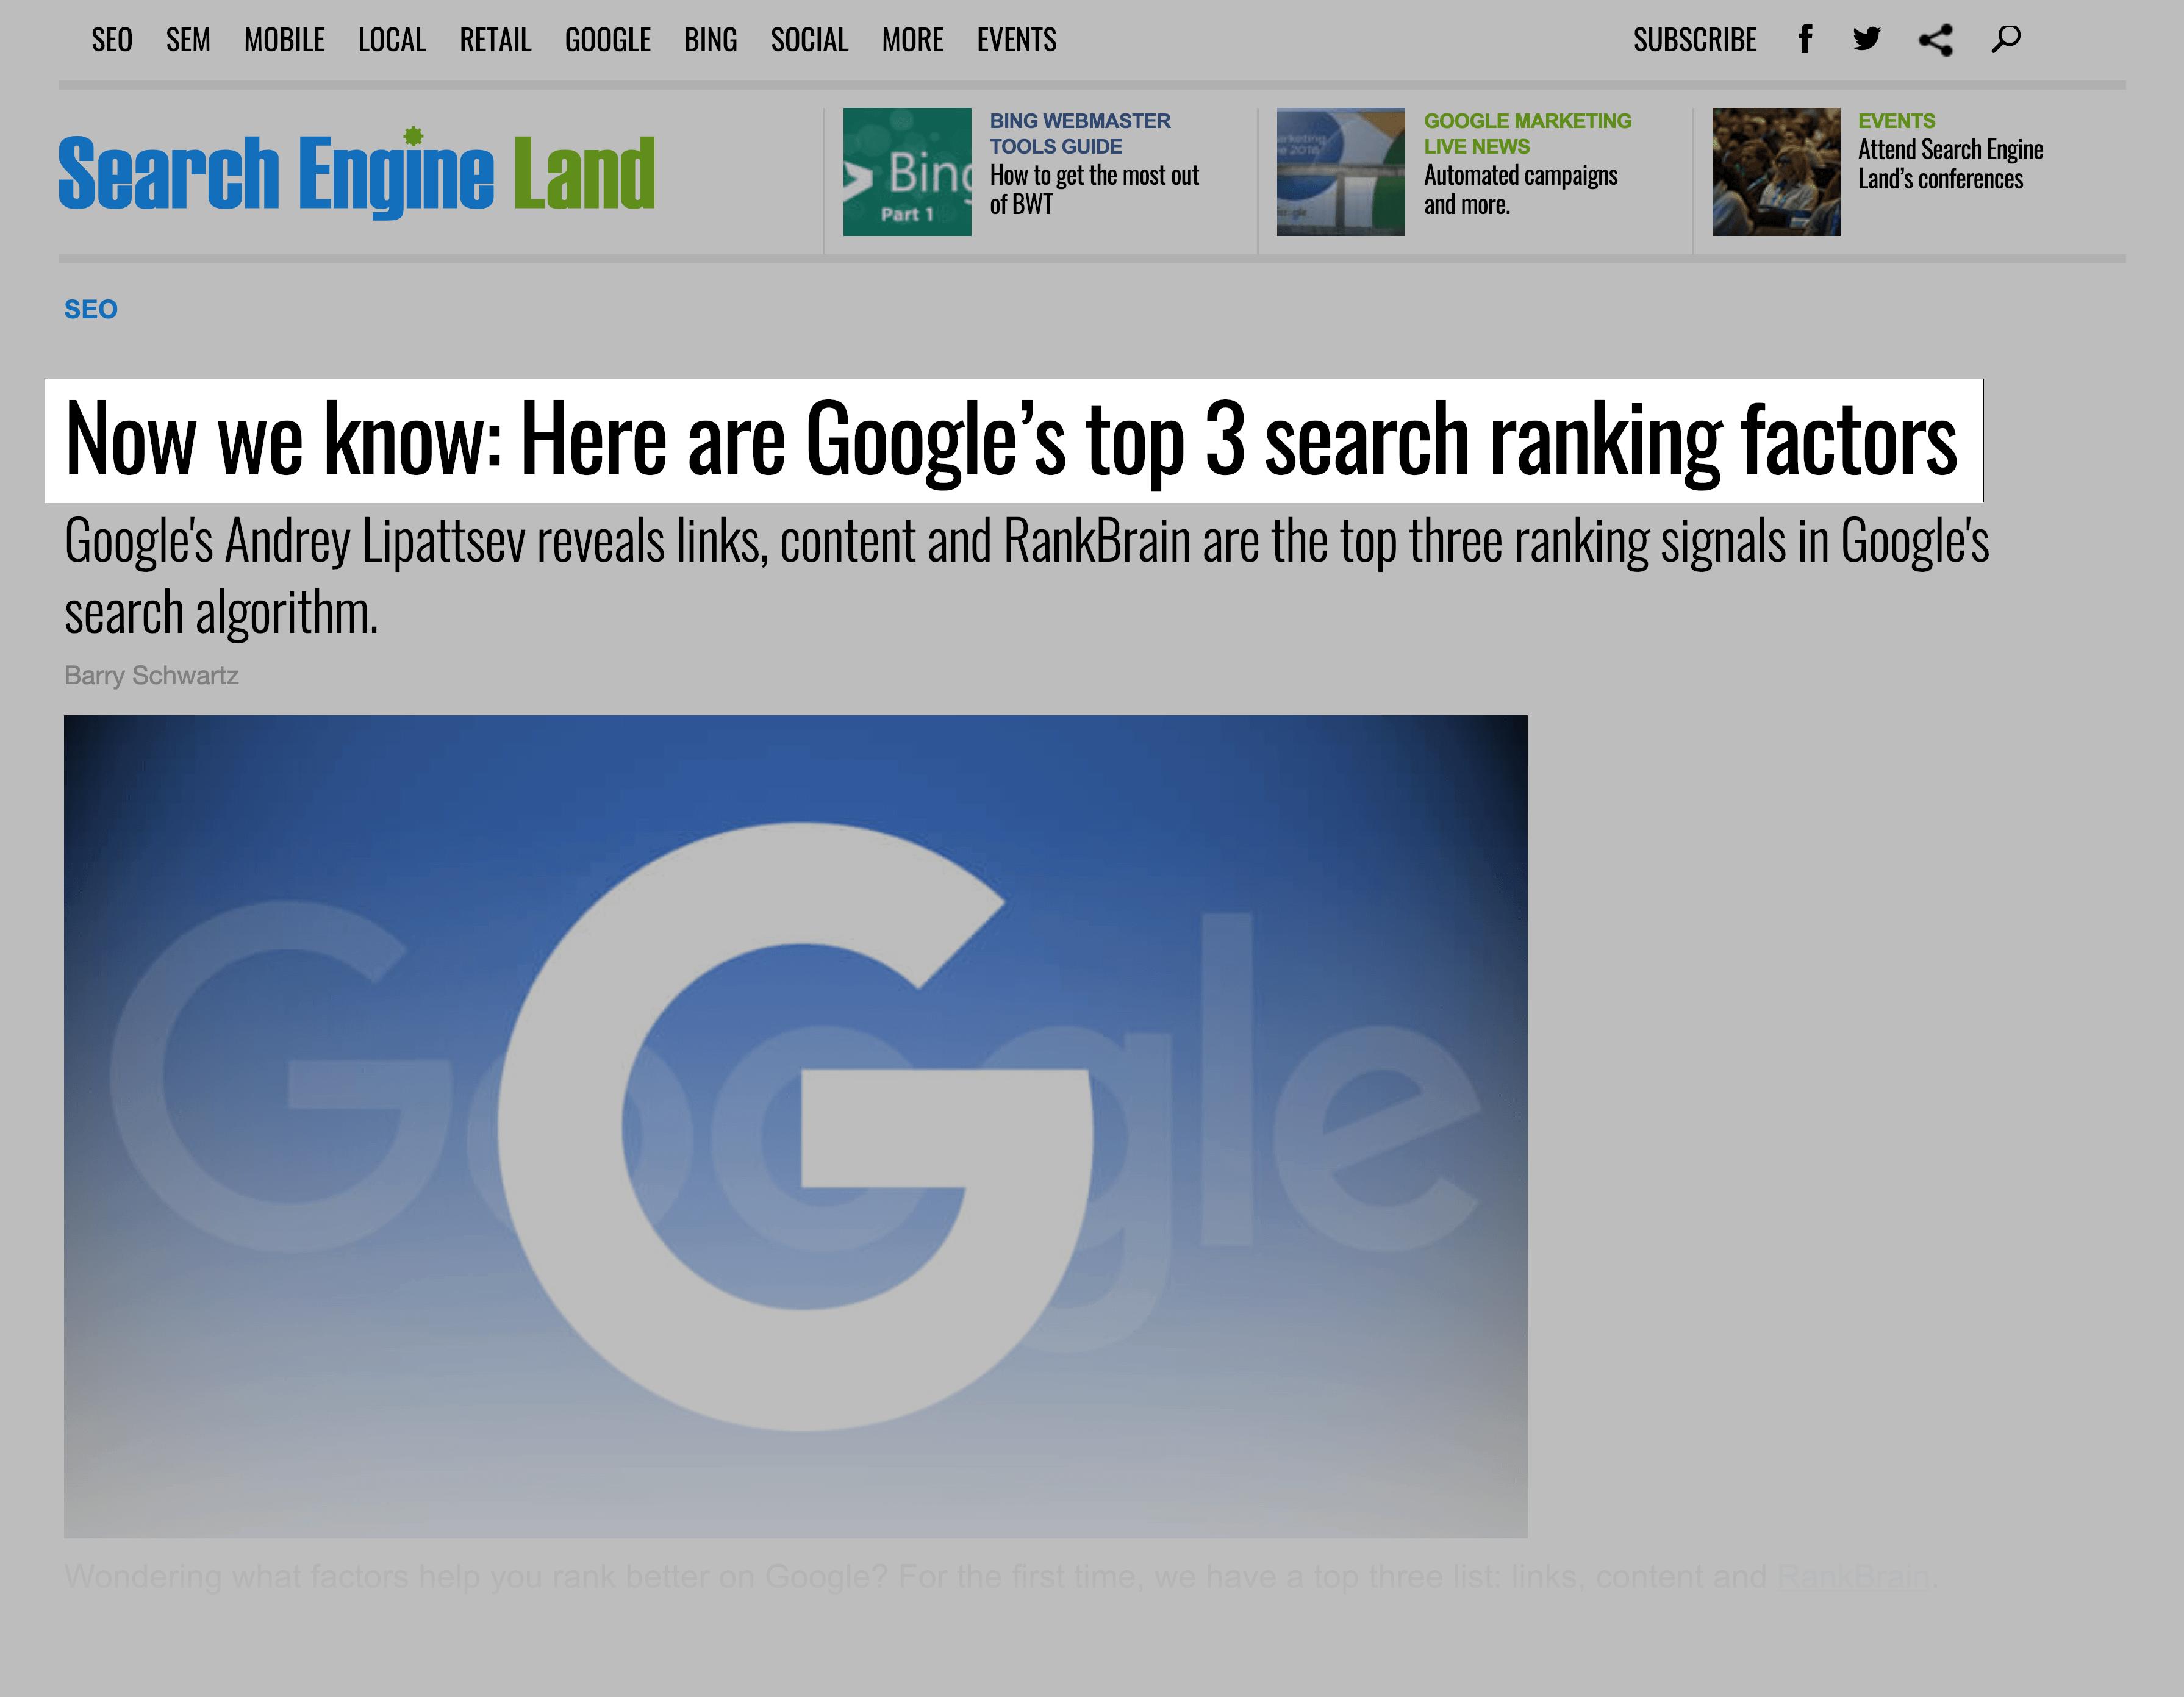 RankBrain is one of Google's top 3 ranking factors